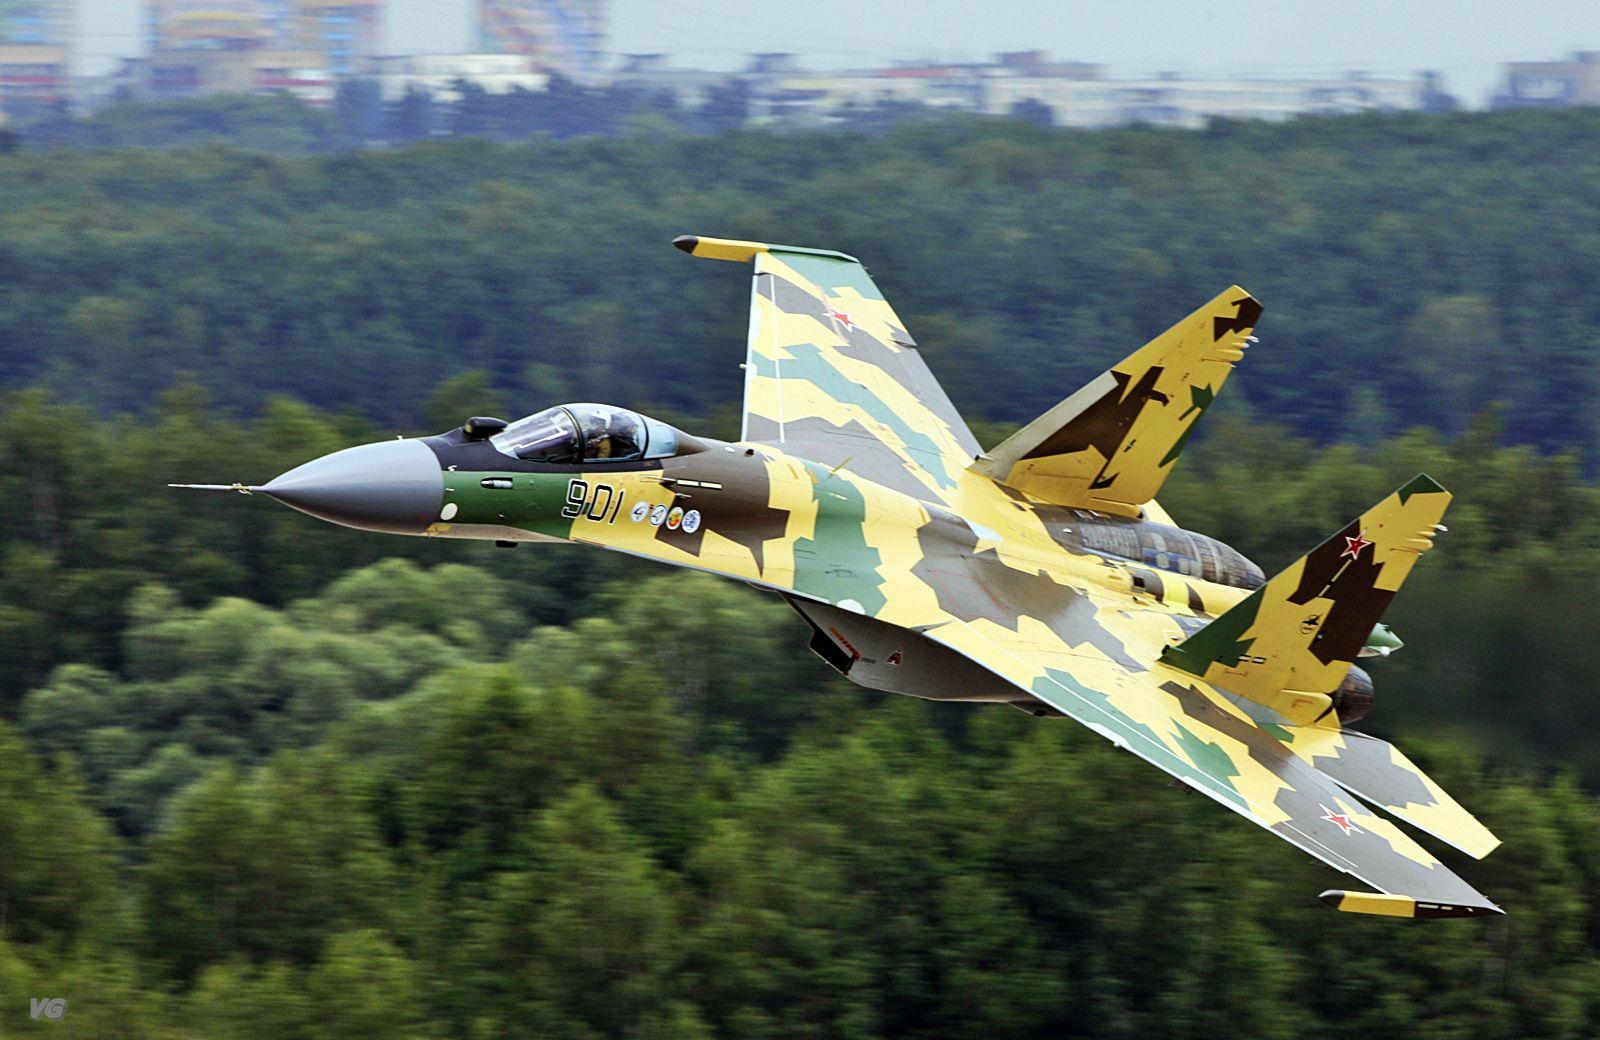 Rusia conquista nuevos mercados de armamento